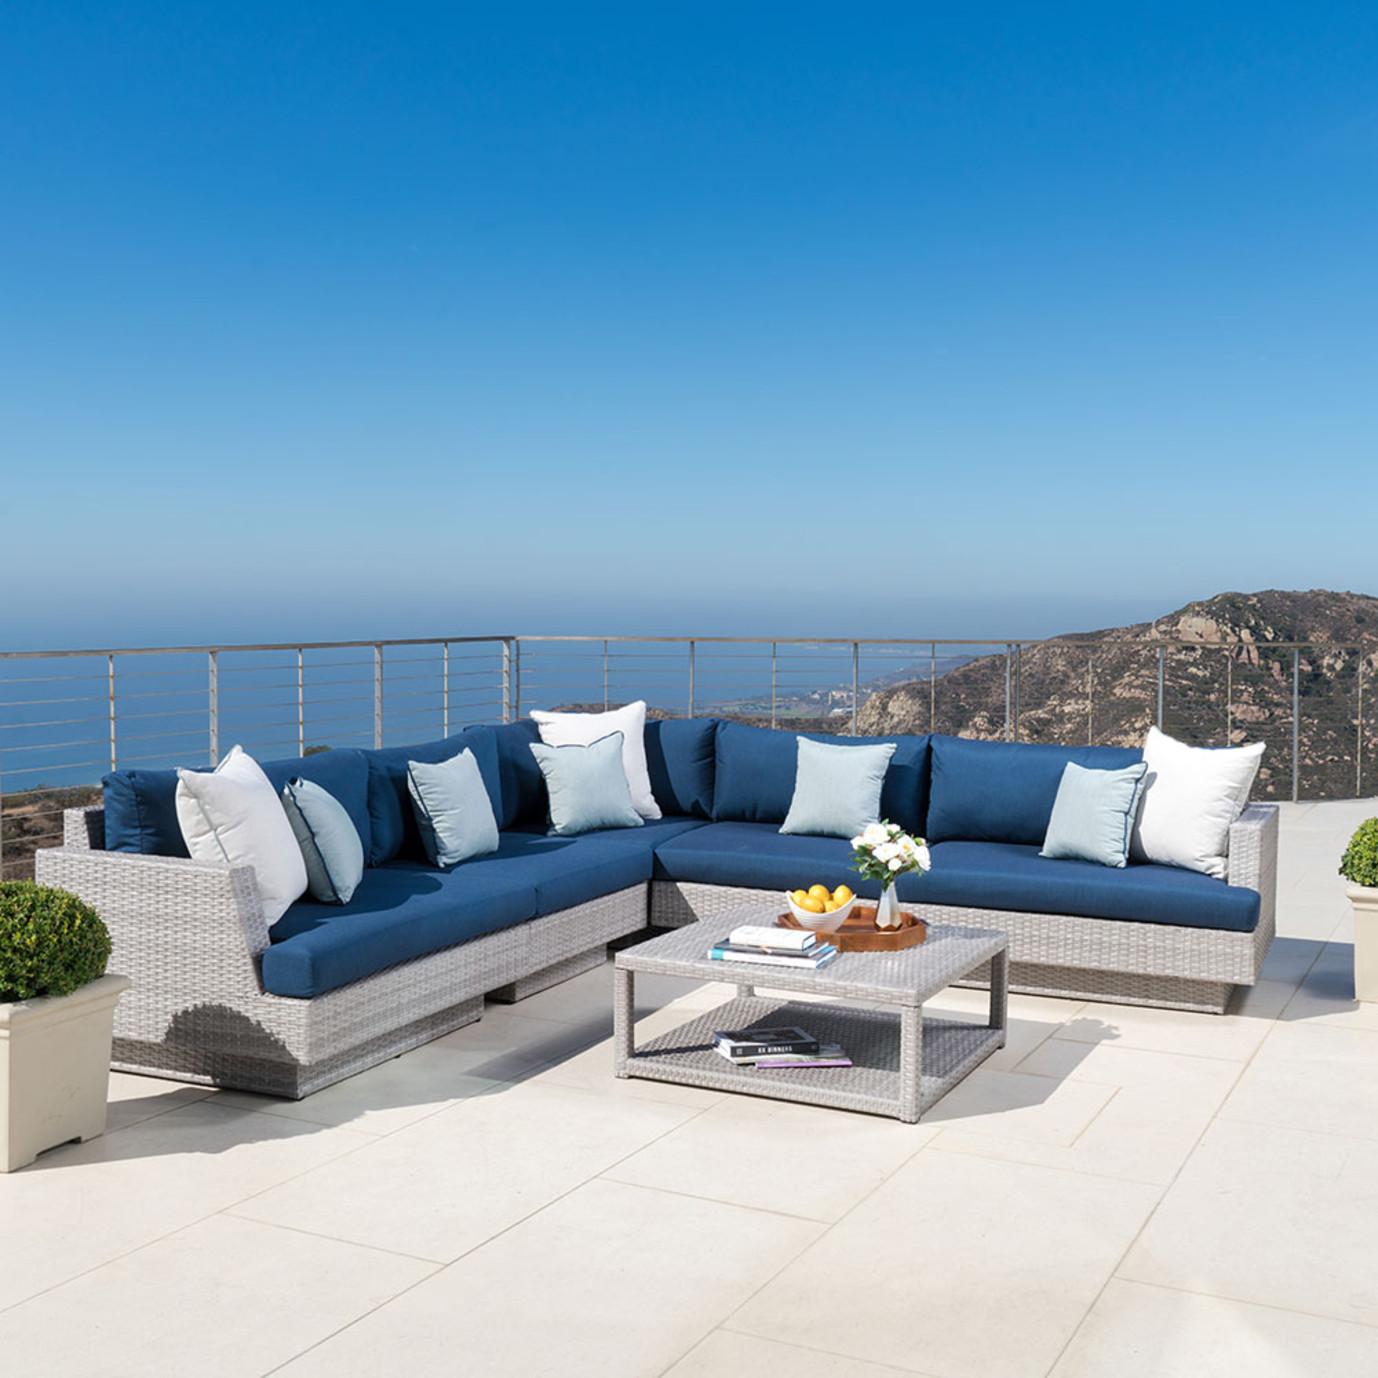 Sofas Set For Sale: Portofino™ Comfort 6pc Sofa Sectional - Laguna Blue